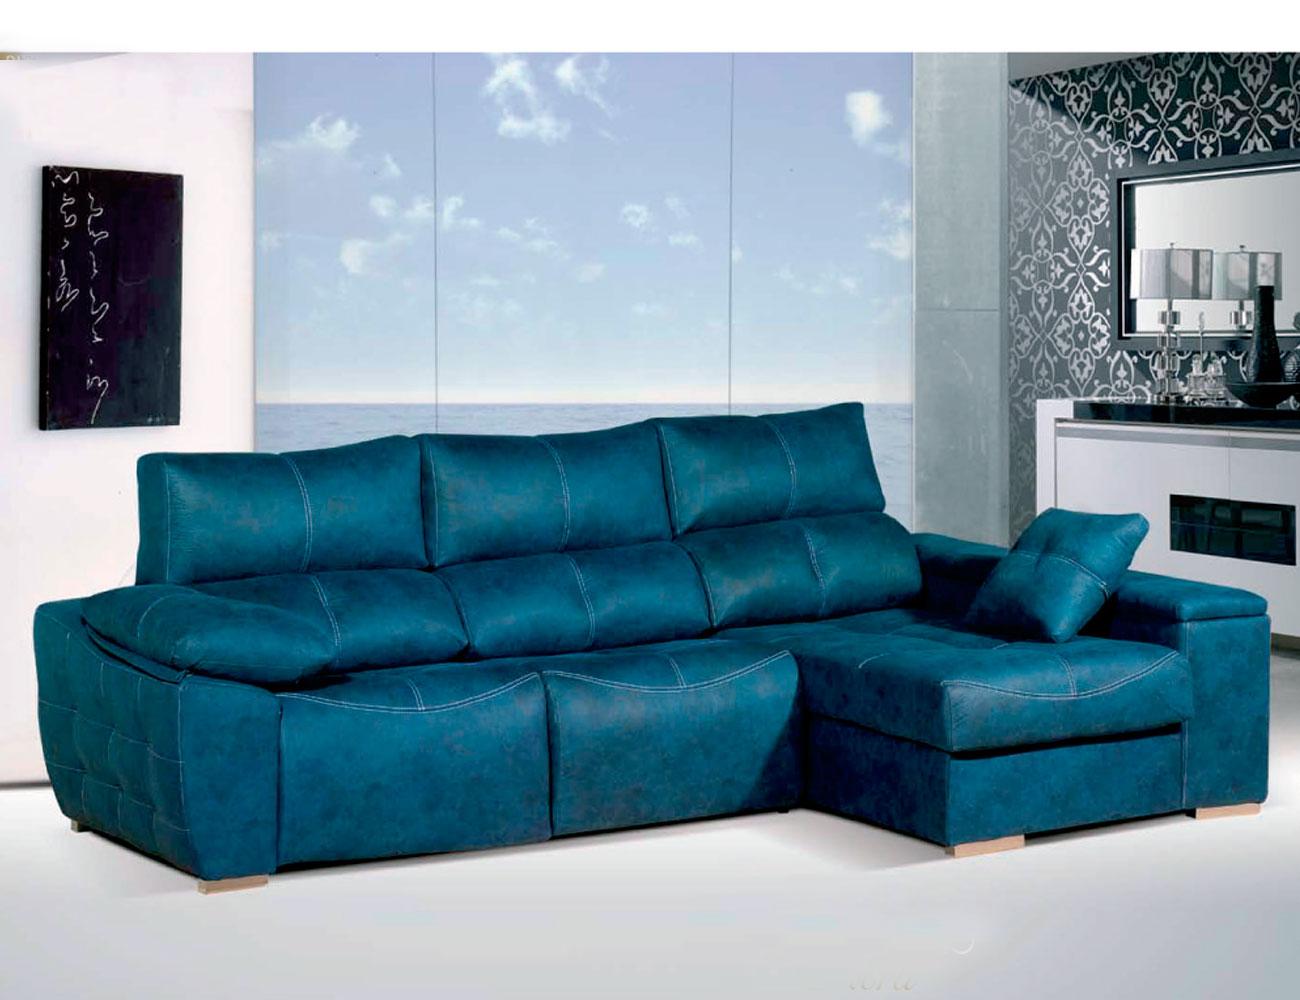 Sofa chaiselongue relax 2 motores anti manchas turquesa35